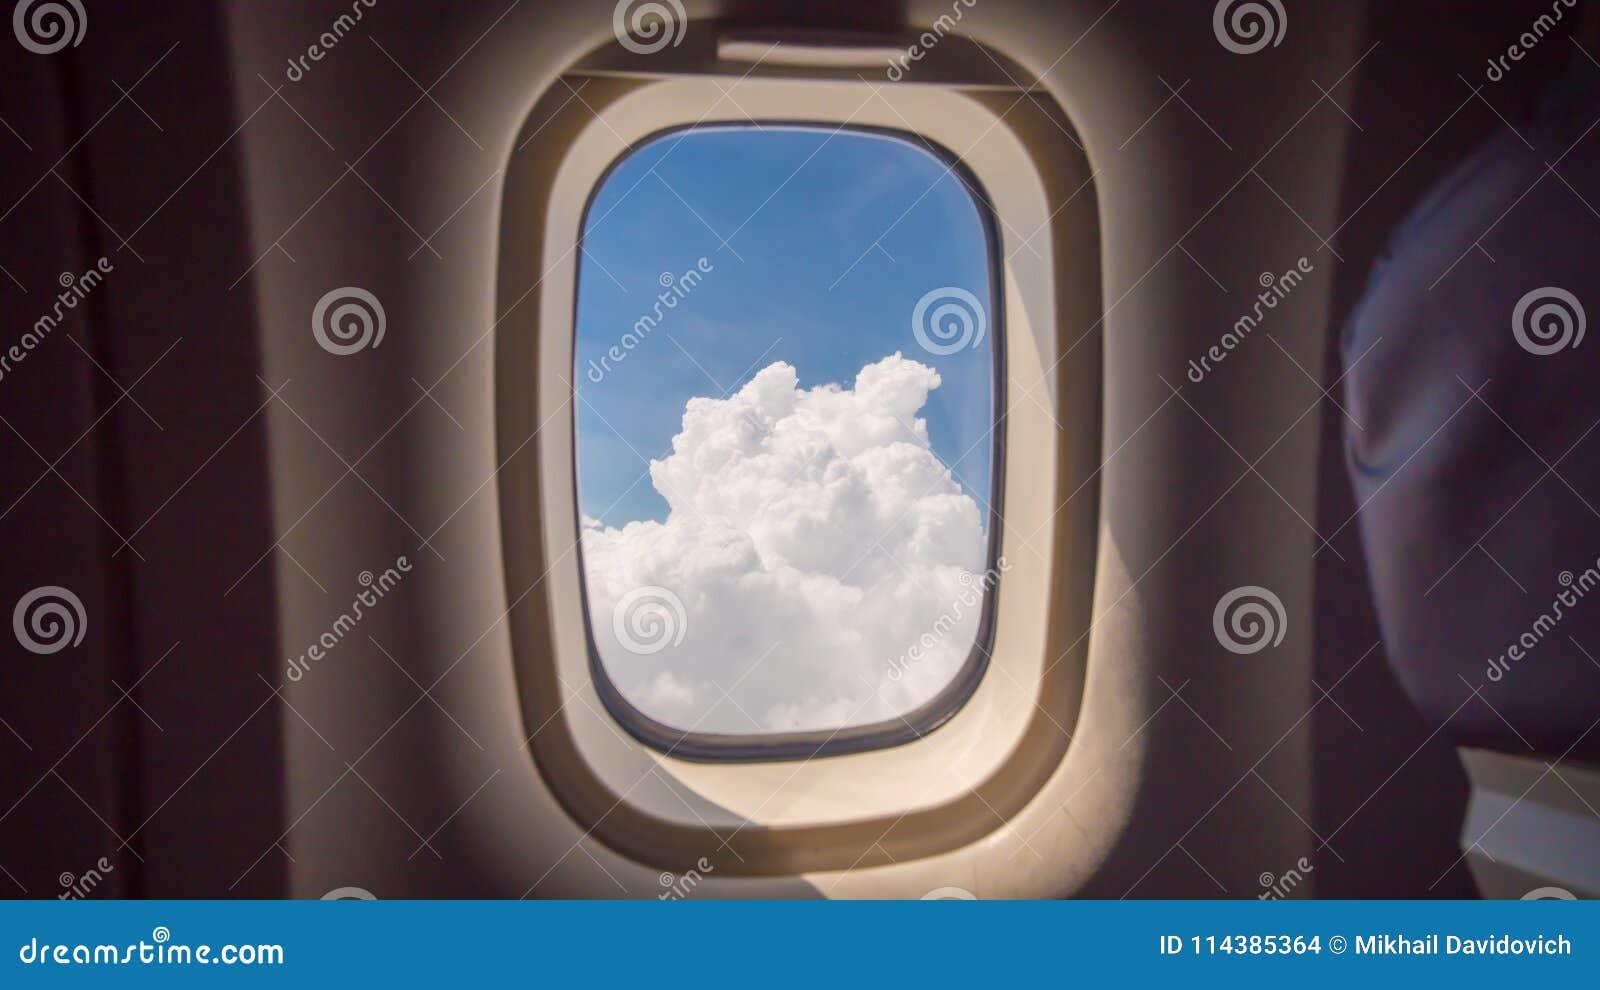 Облака и небо как увиденное до конца окно воздушного судна